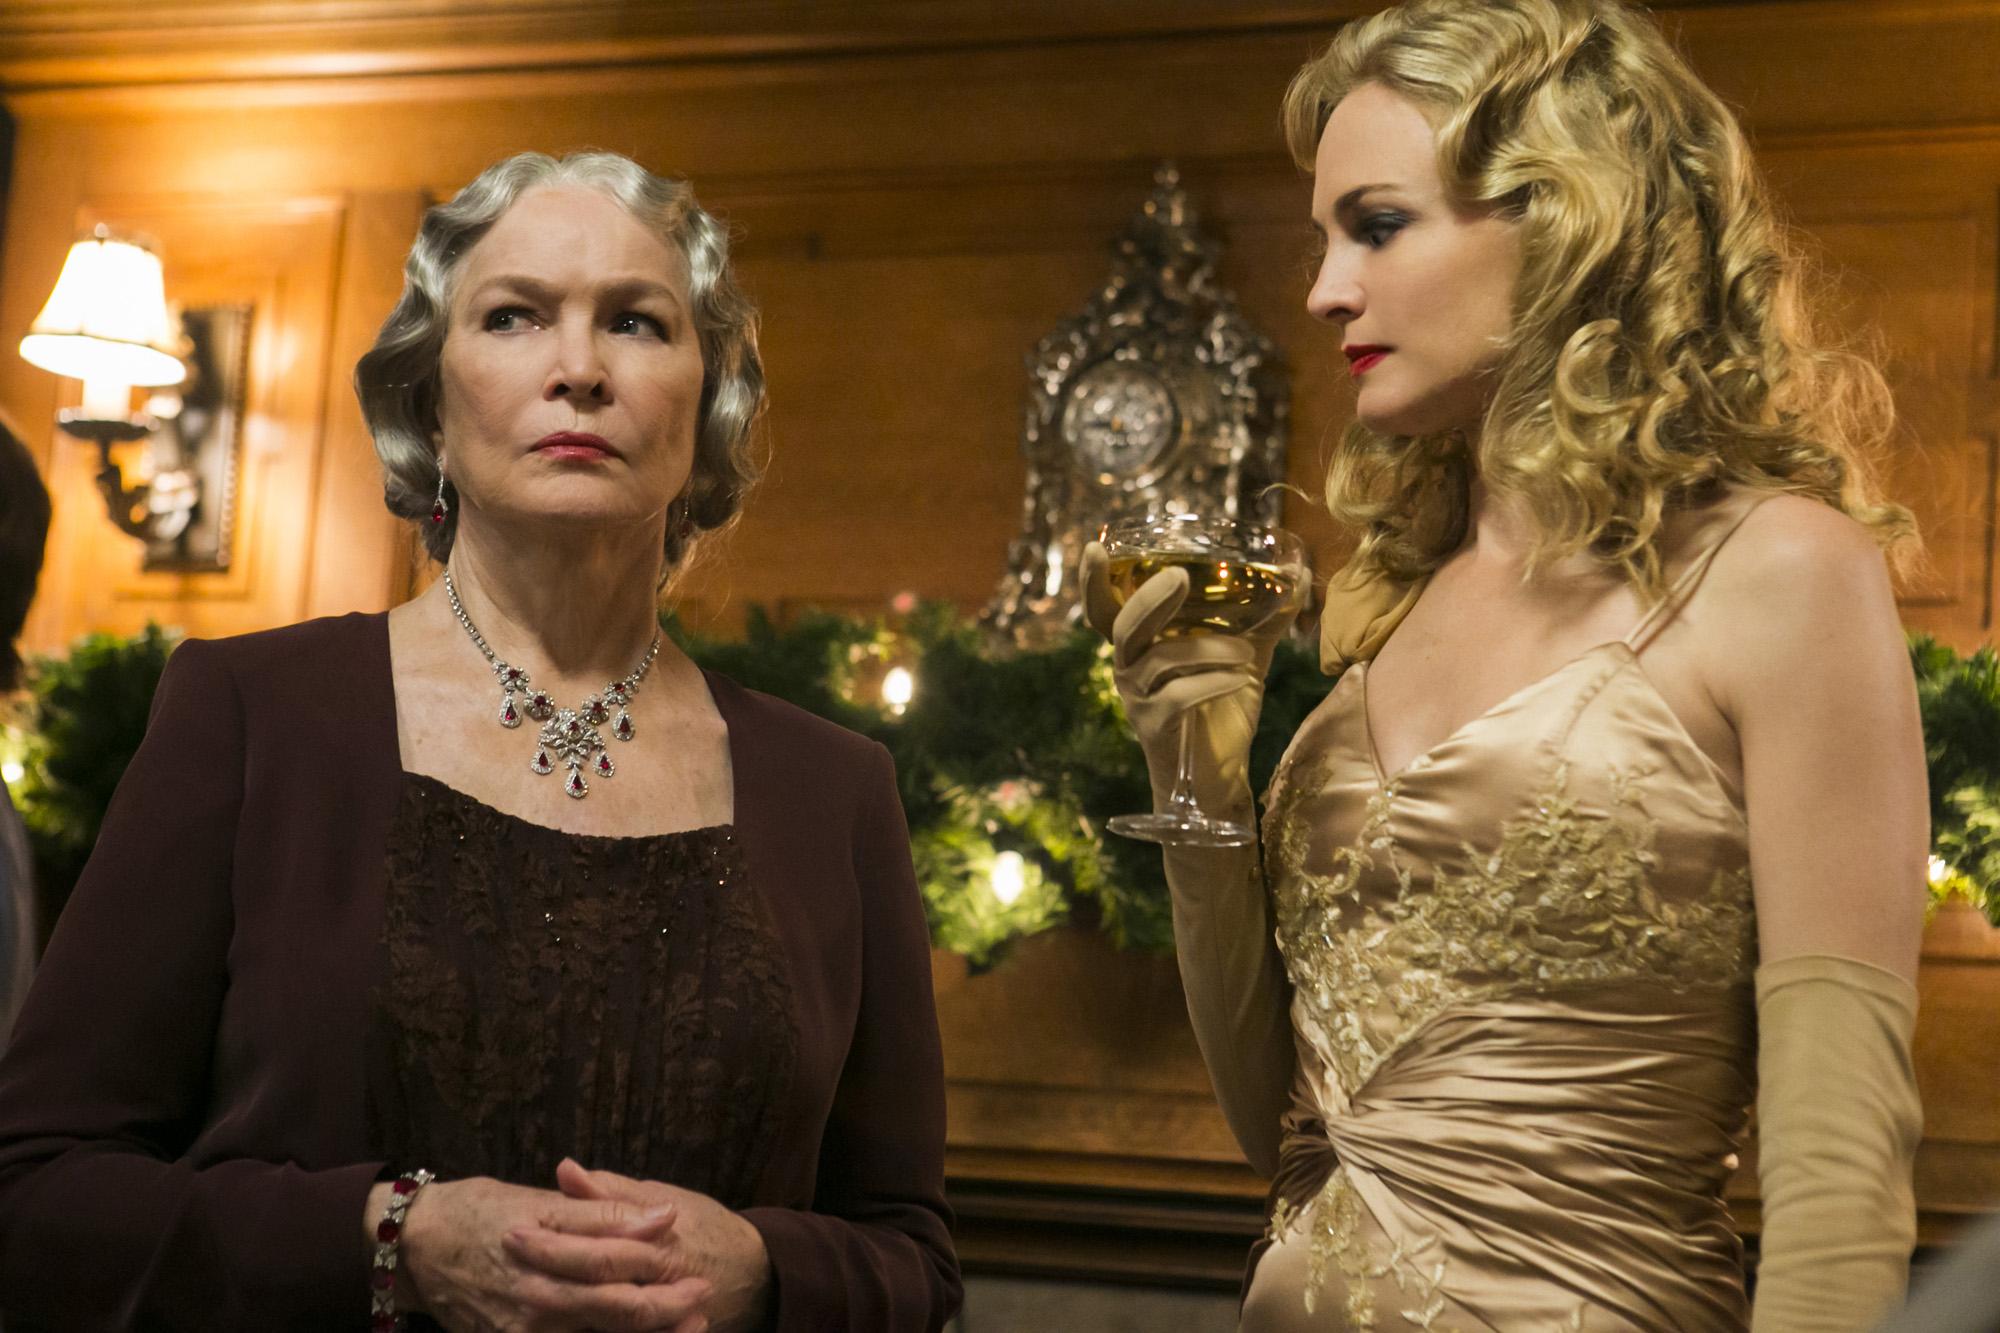 The children's grandmother Ellen Burstyn and mother Heather Graham in Flowers in the Attic (2014)